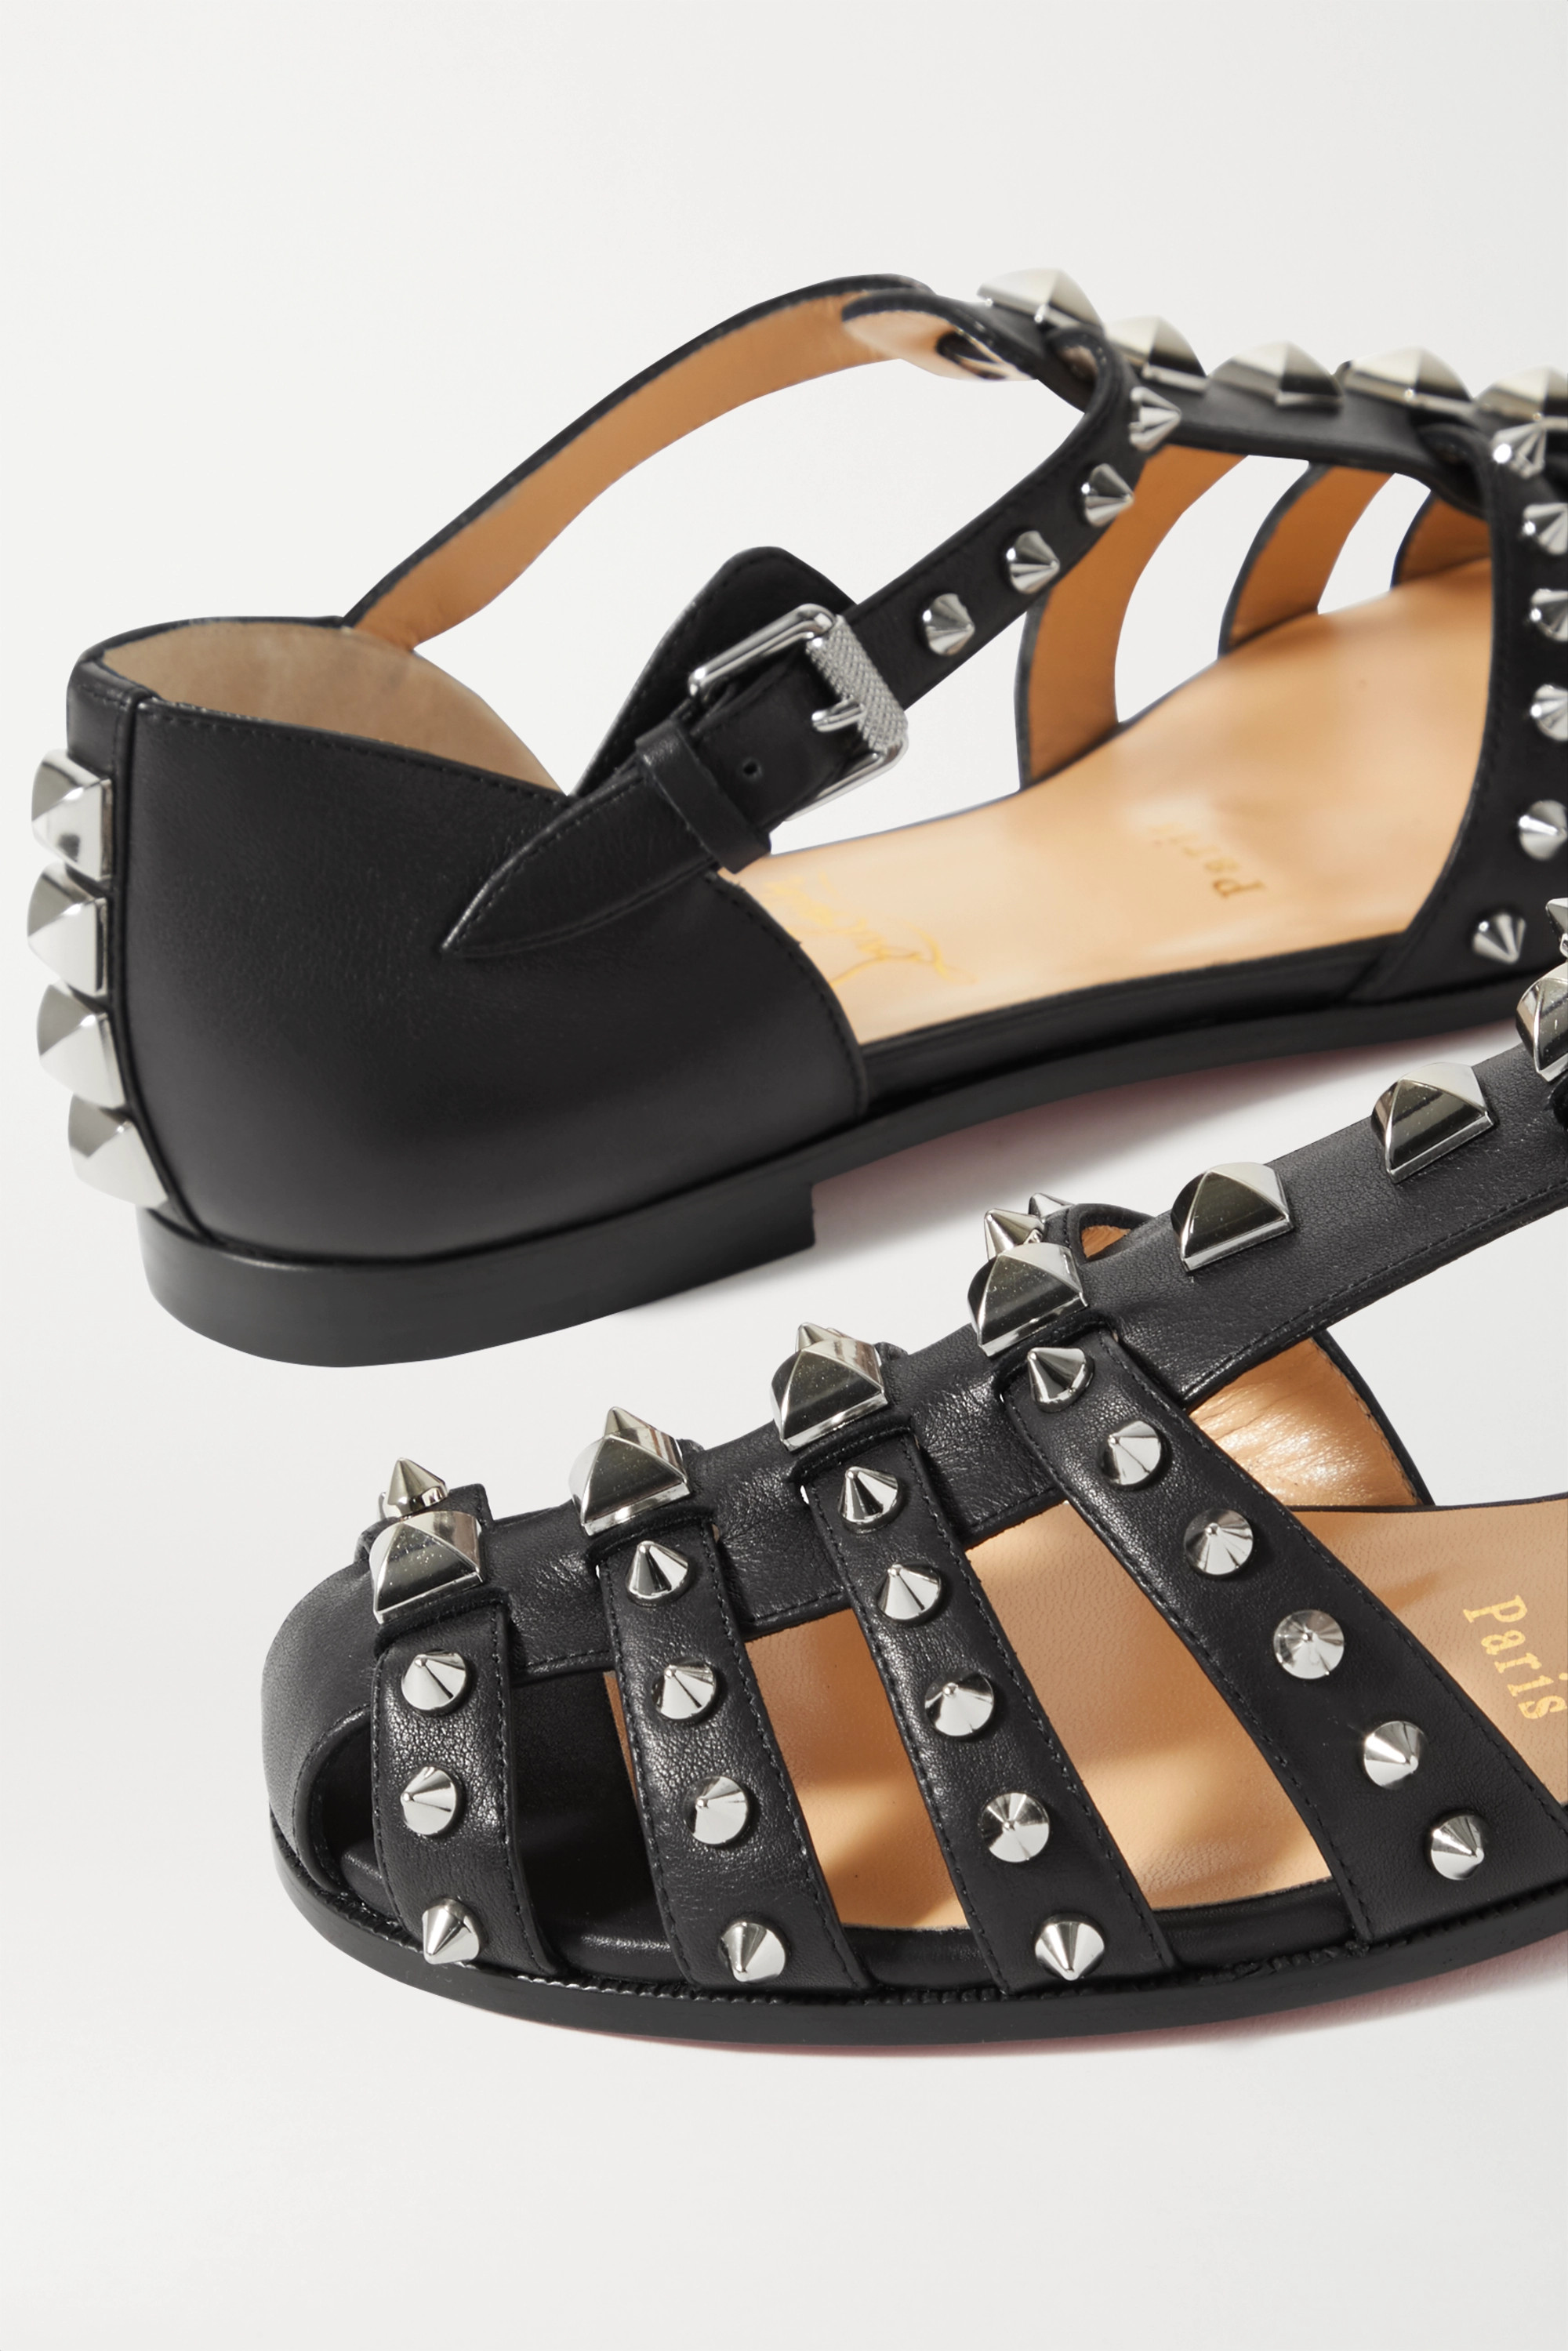 Christian Louboutin LoubiClou studded leather sandals